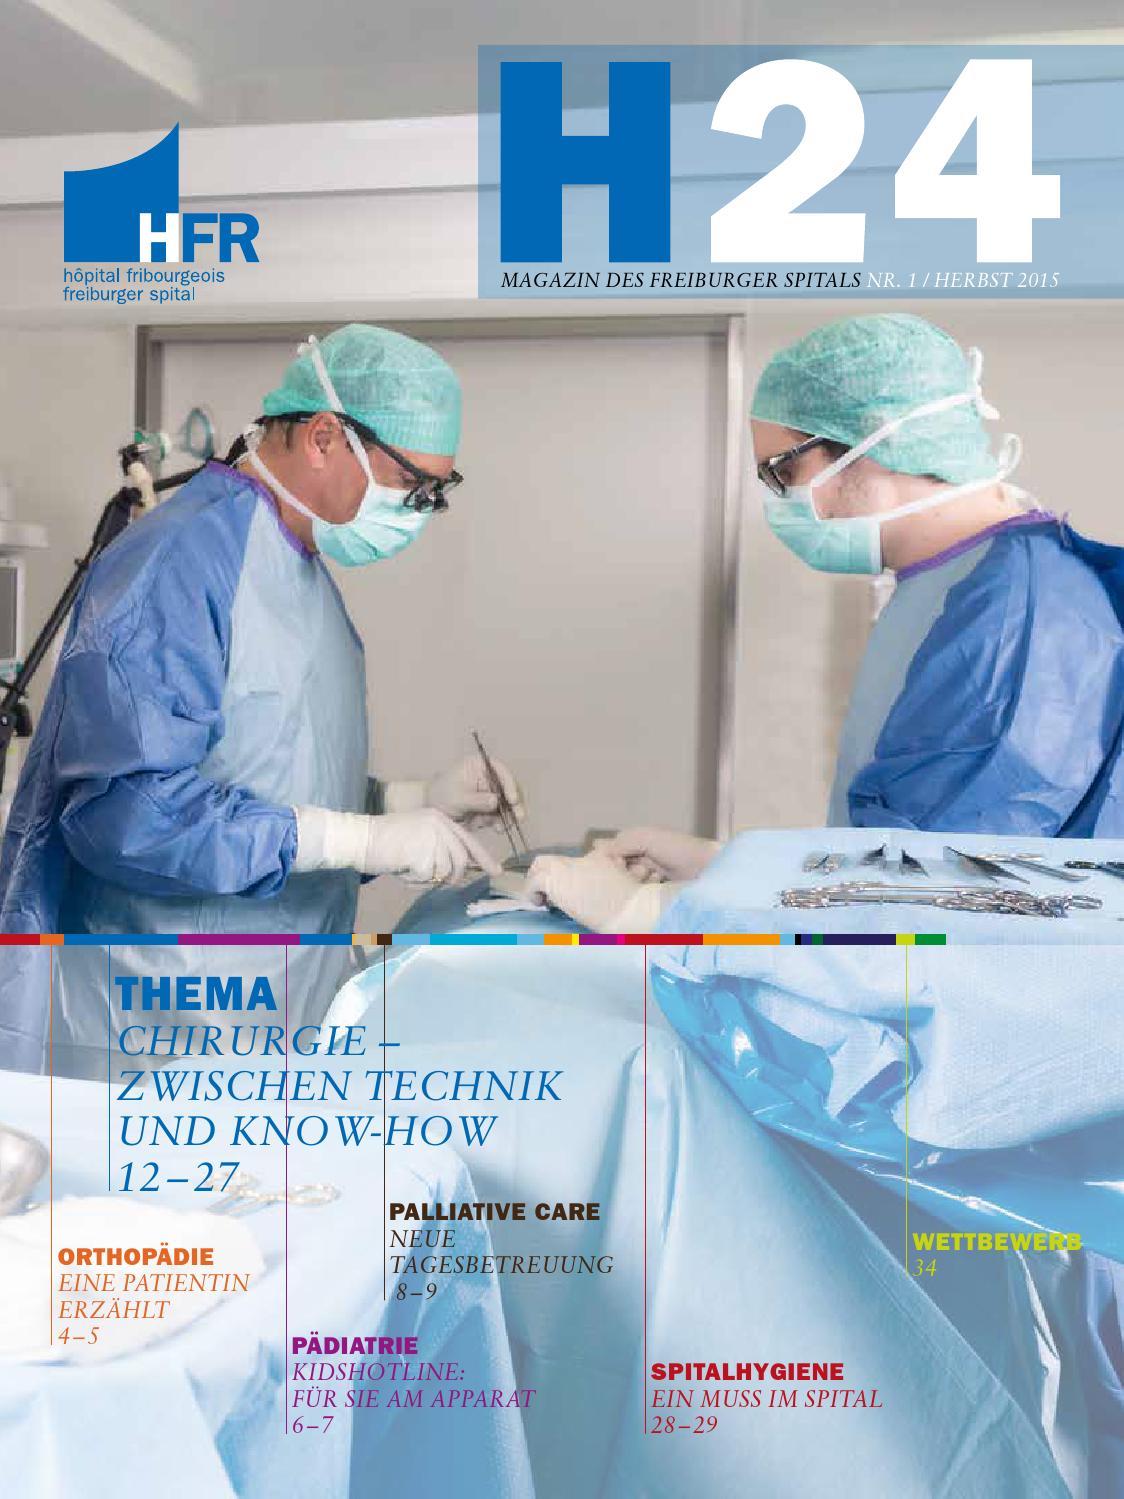 H24 – Magazin des freiburger spitals (HFR) – Nr. 1 (Herbst 2015) by ...